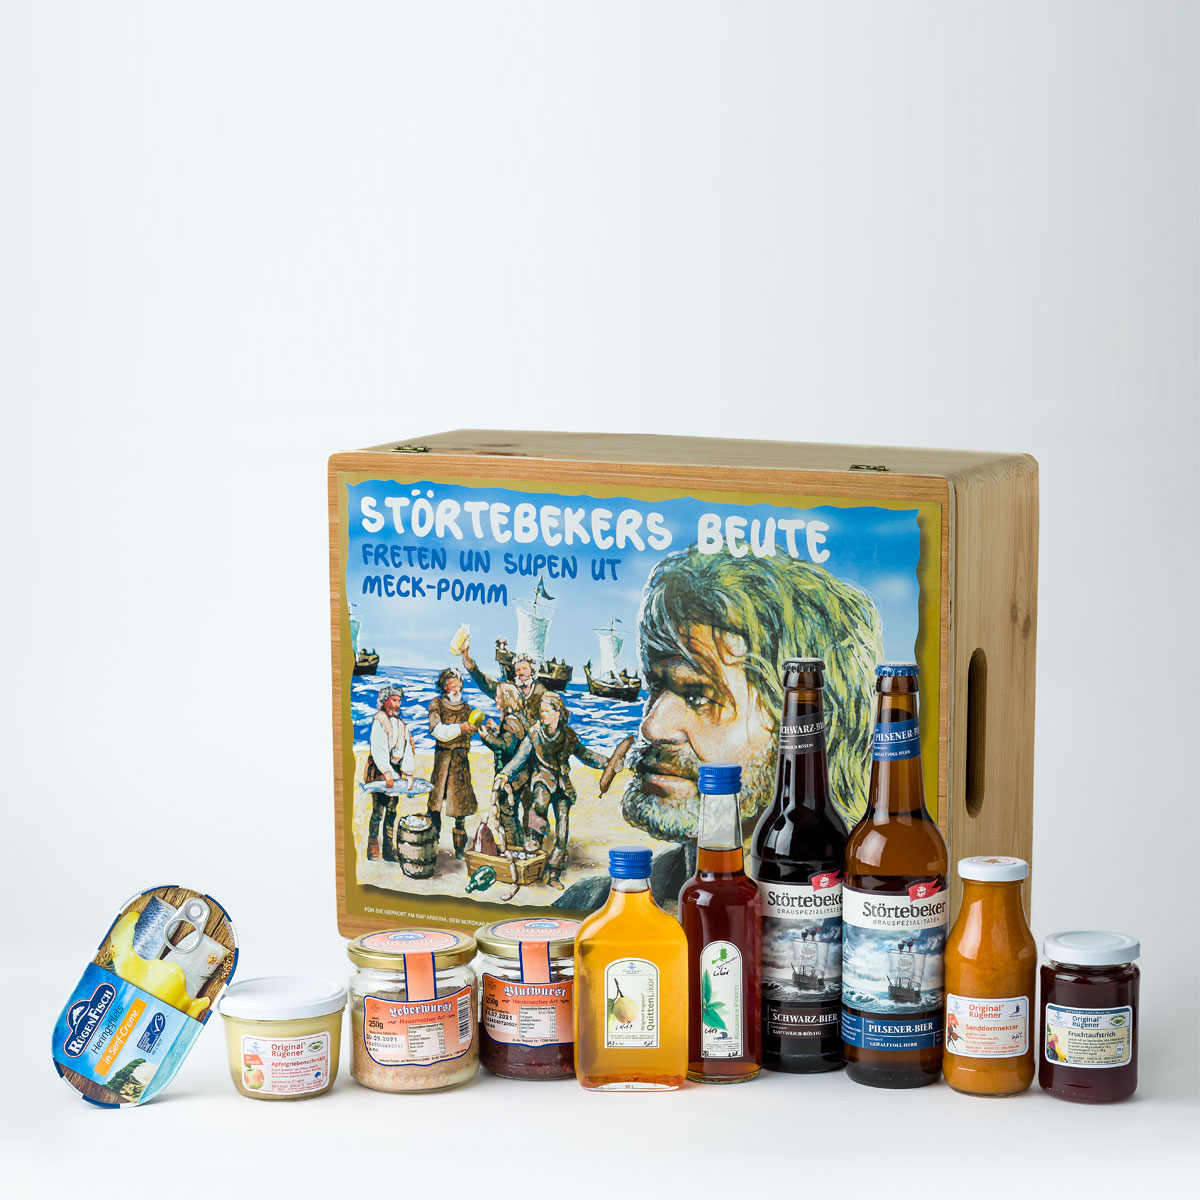 Rügenprodukte online kaufen – Störtebekers Beute Kiste